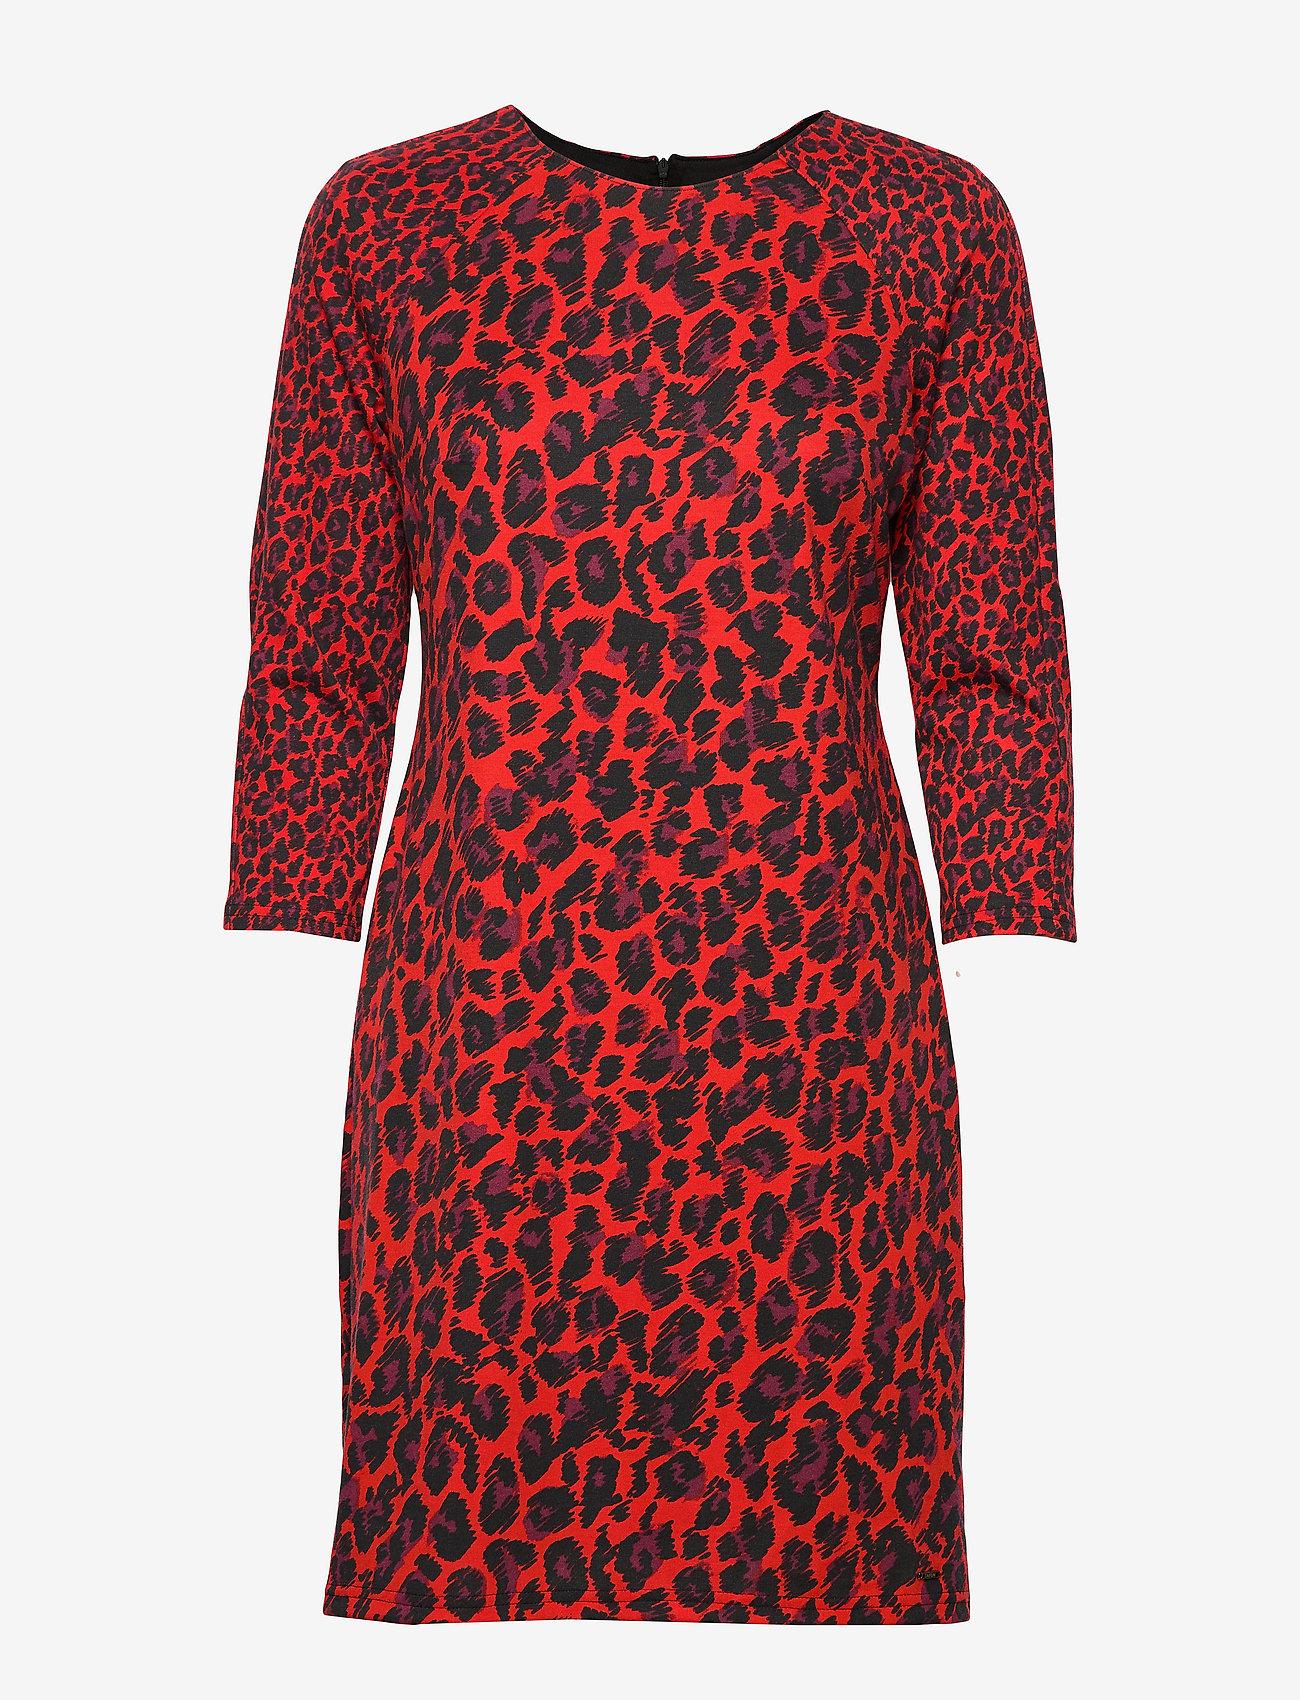 Taifun - DRESS WOVEN FABRIC - korta klänningar - lipstick red patterned - 0